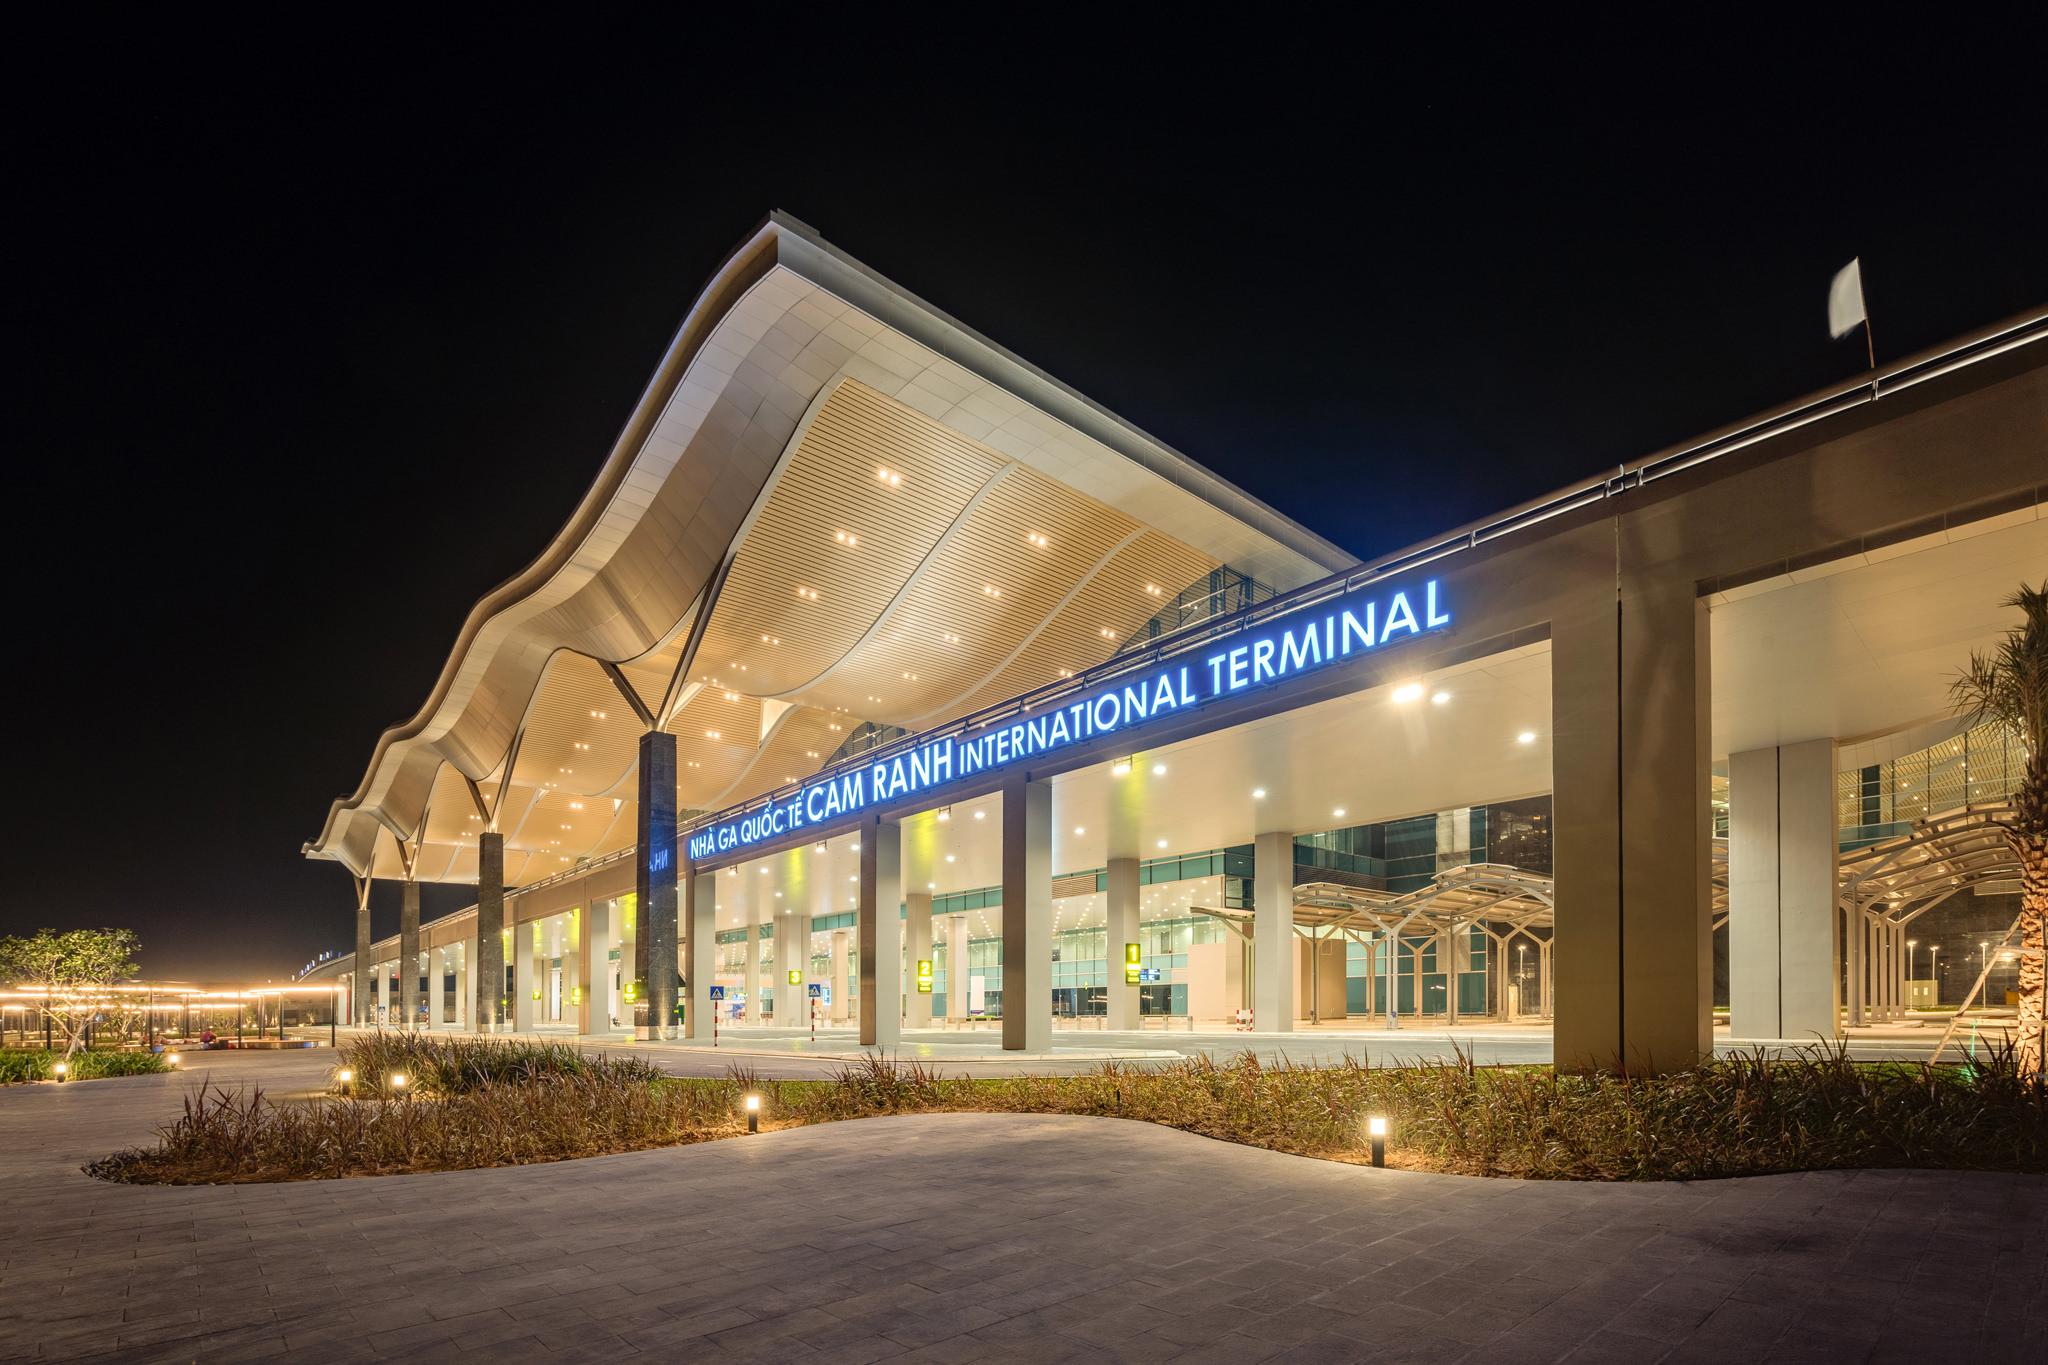 20180626 - Cam Ranh Airport - Architecture - 0407.jpg